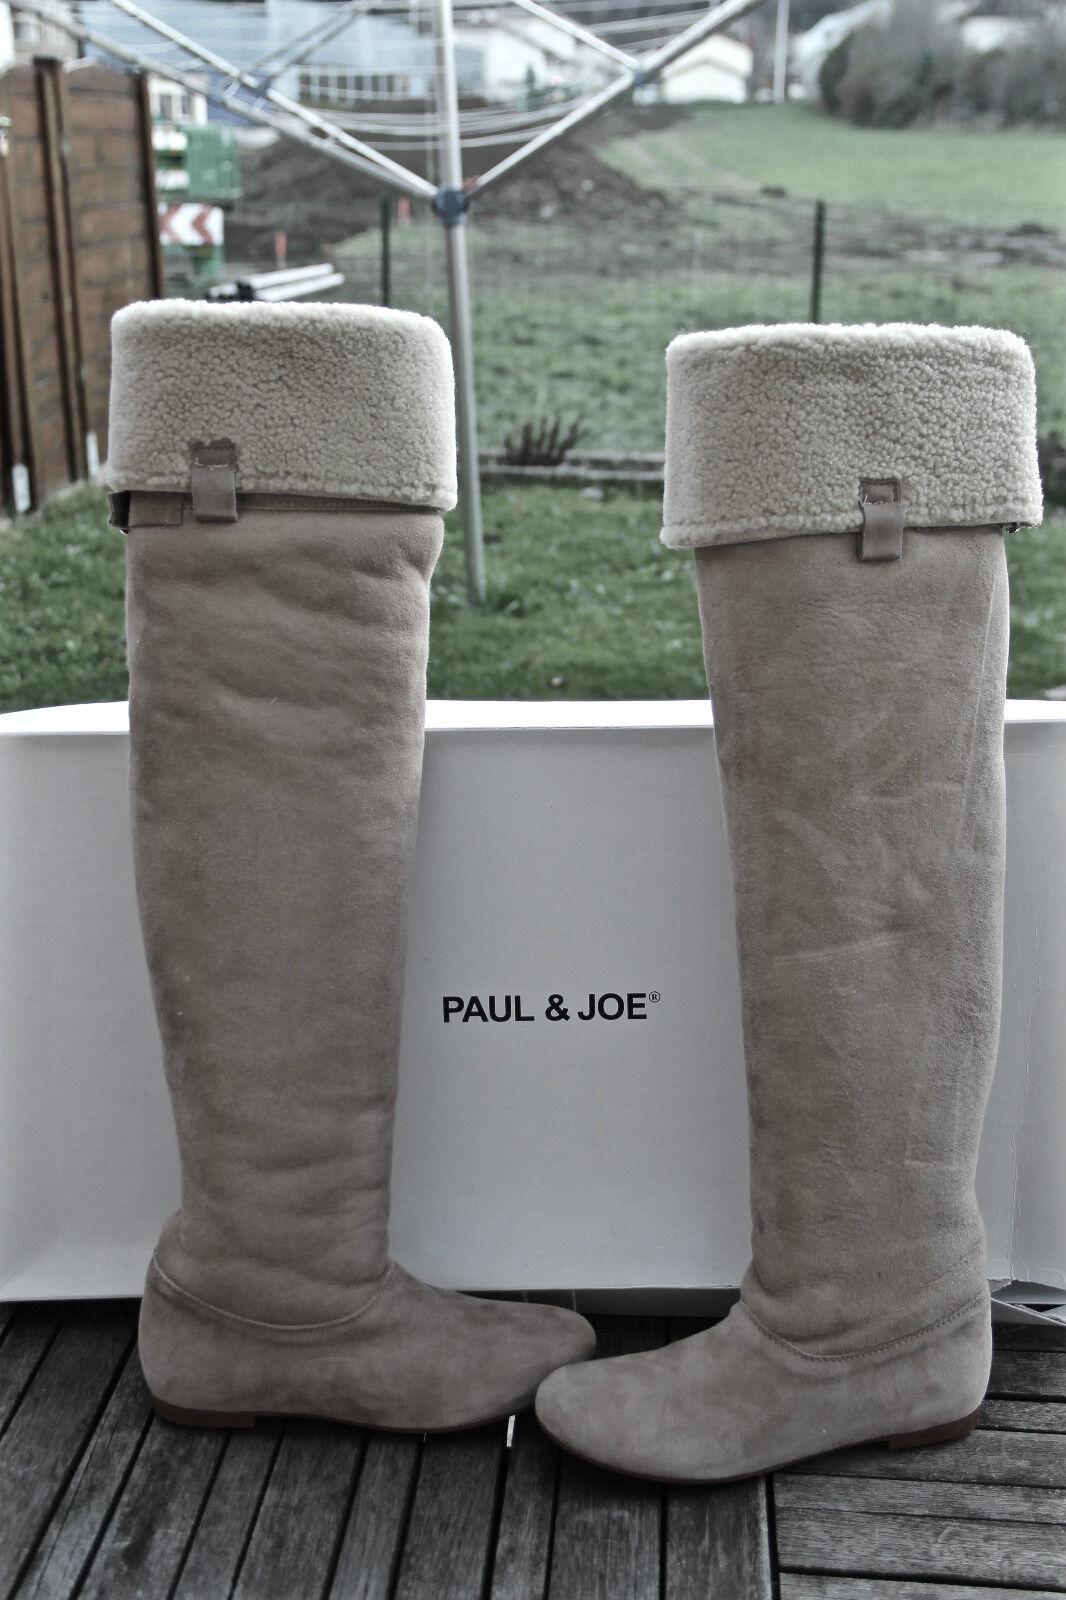 Boots hide returned beige PAUL & JOE carlie P 36 (UK 3,5) NEW value